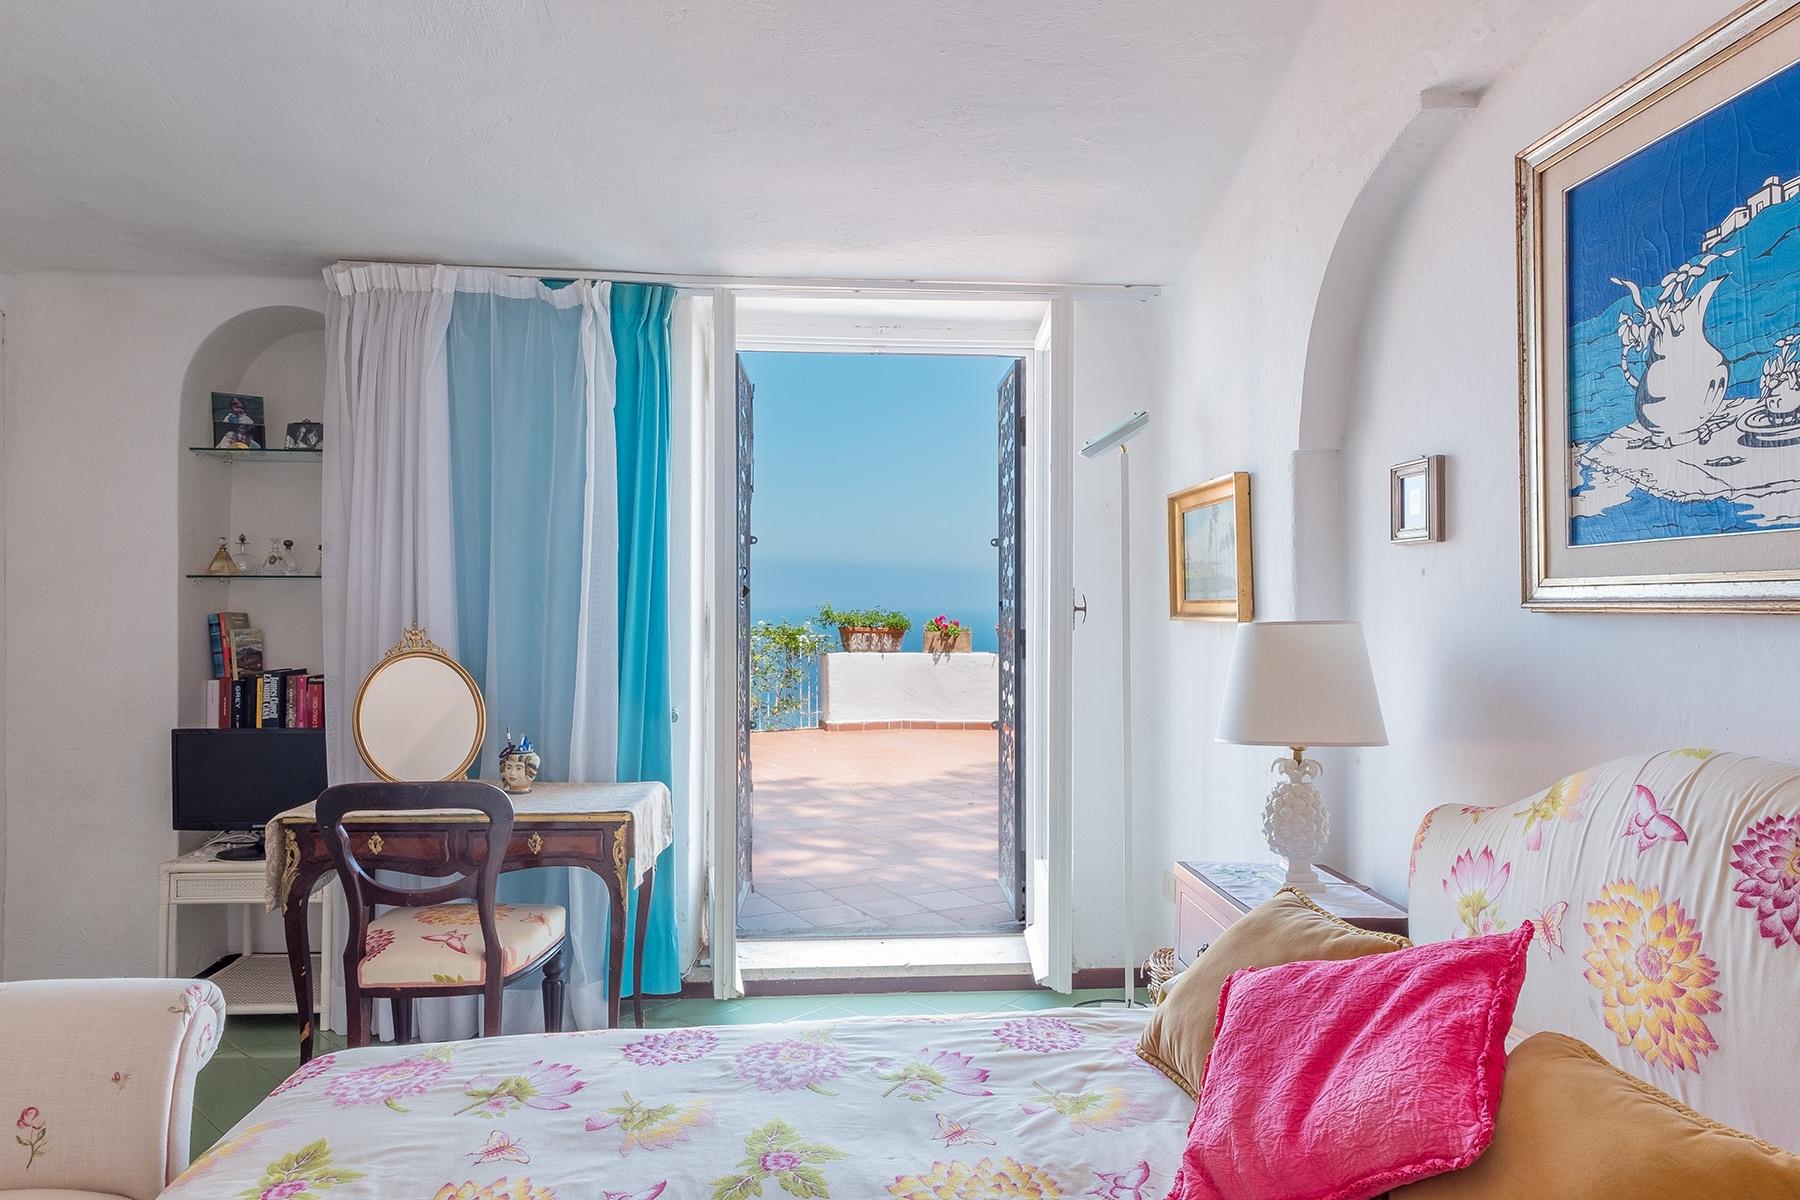 Villa in Vendita a Ischia: 5 locali, 206 mq - Foto 12